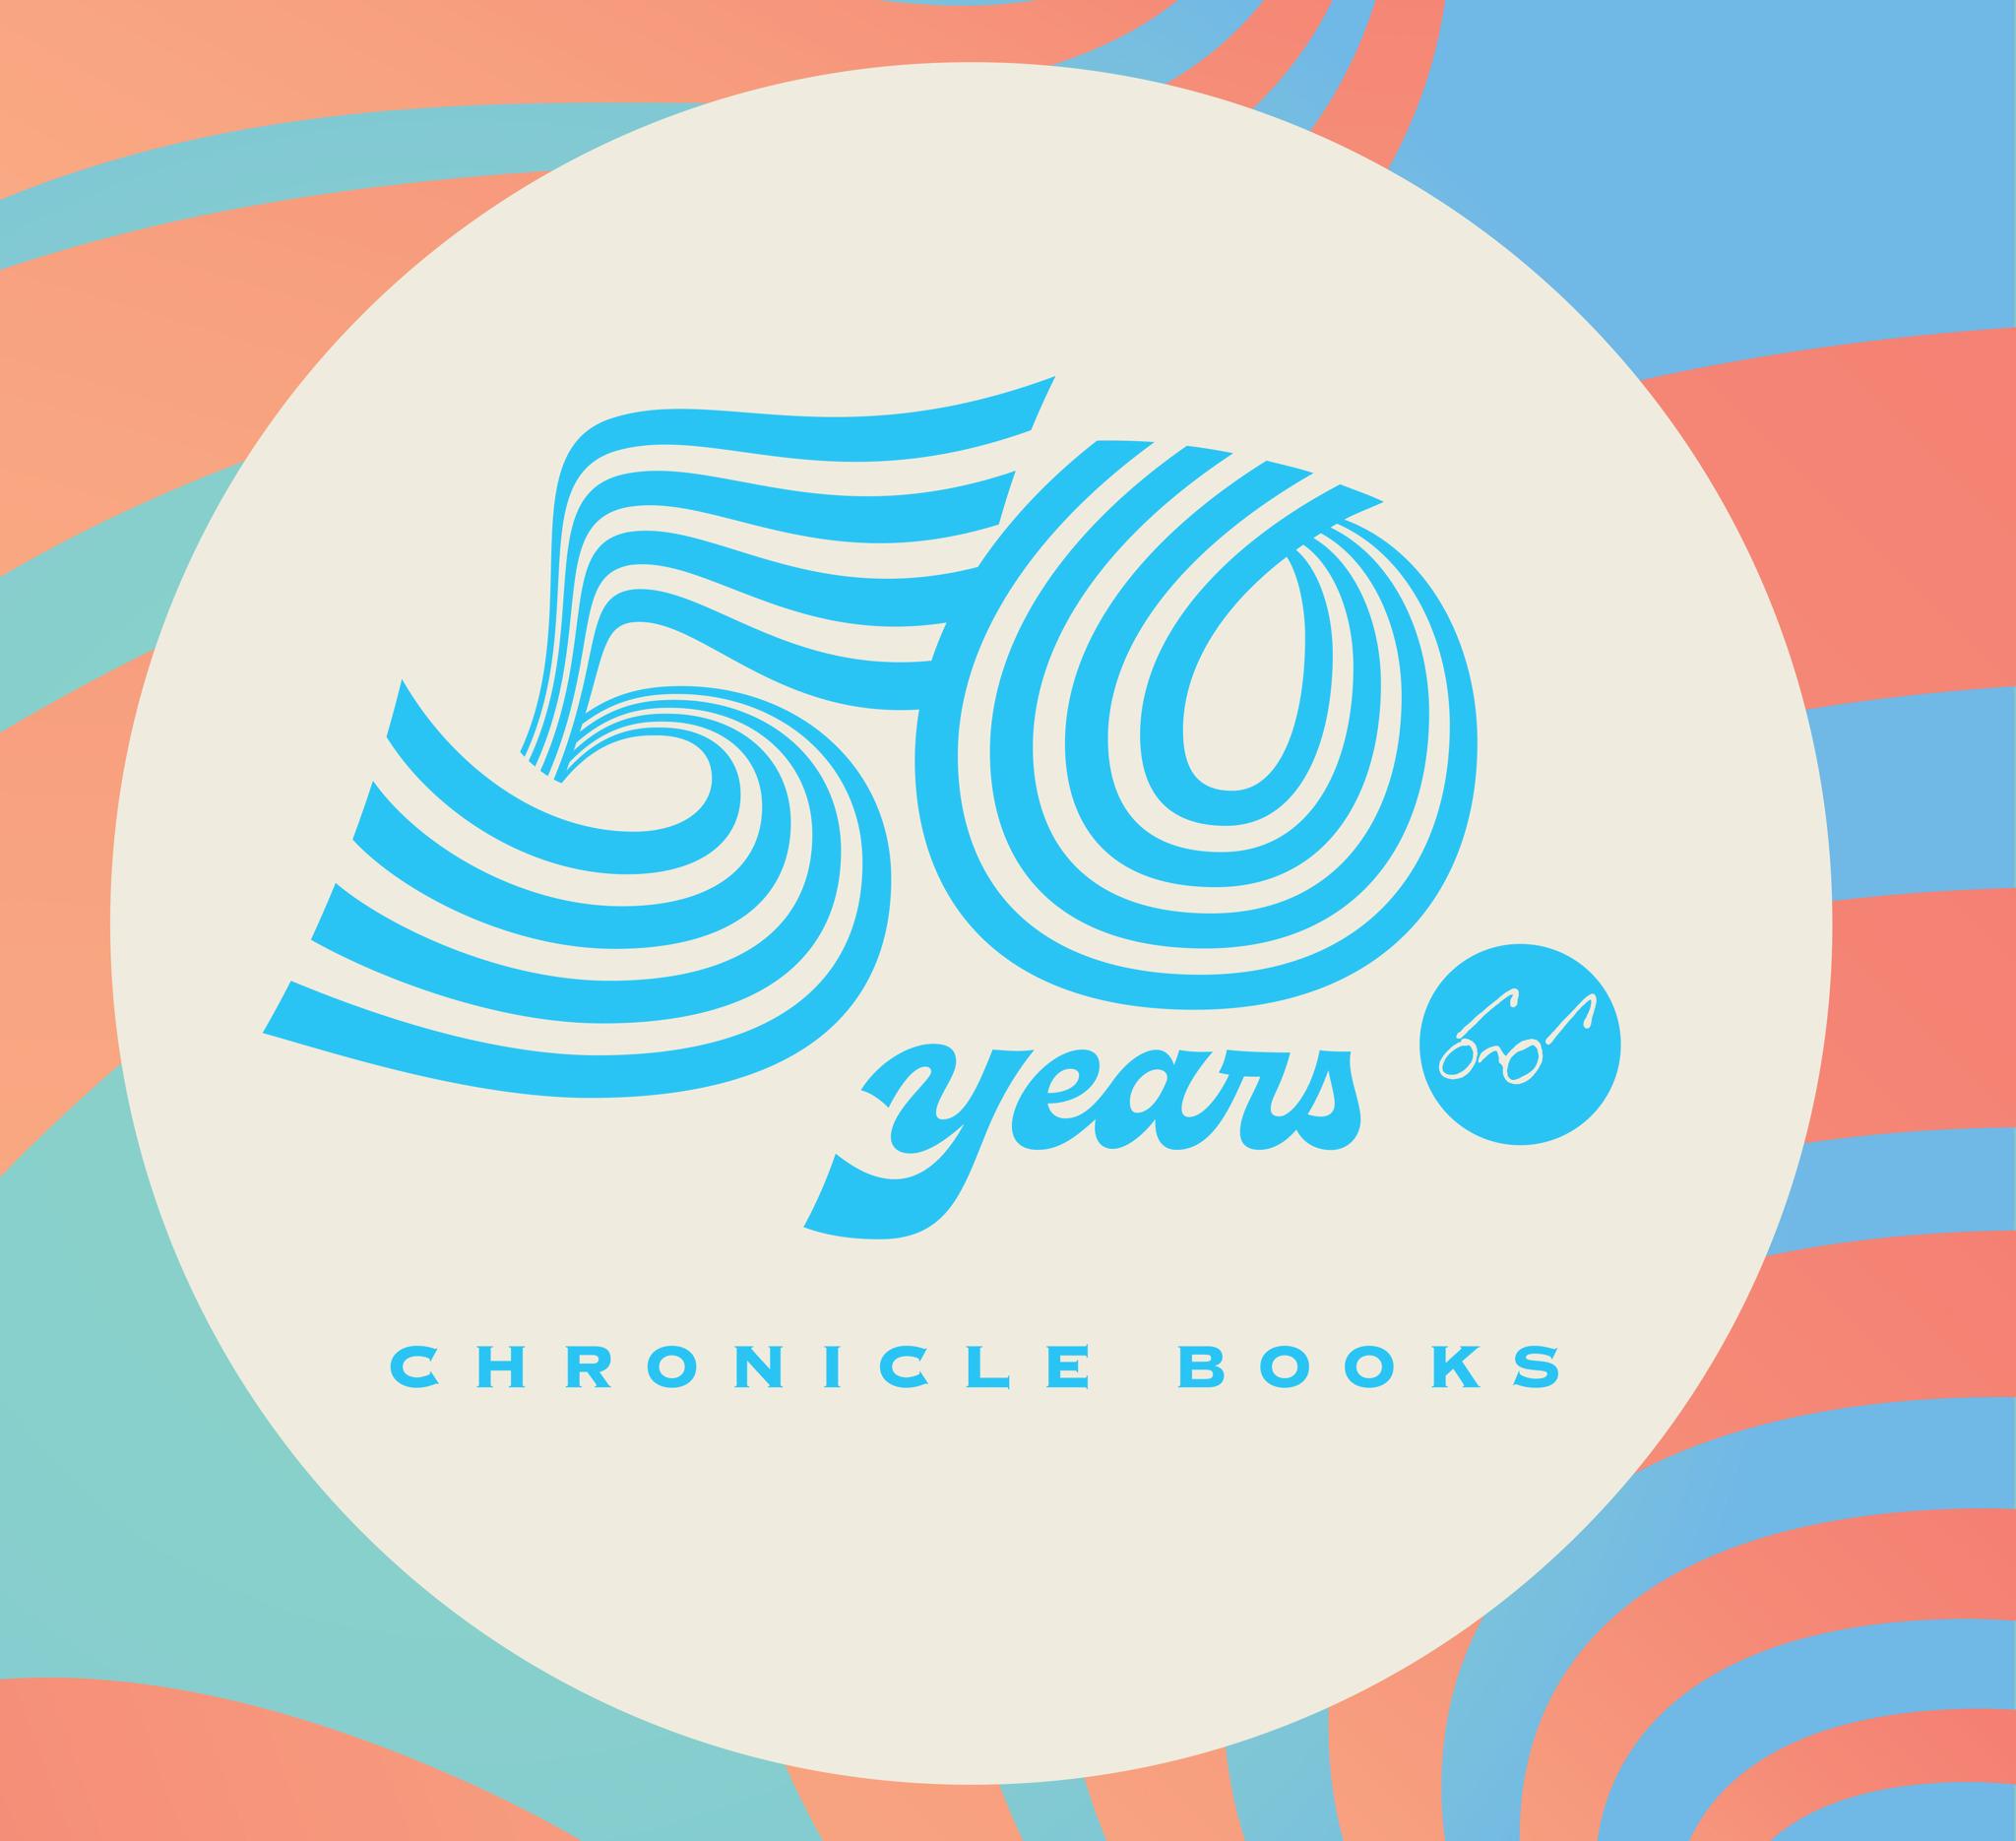 Press Release: Chronicle Books Celebrates 50 Year Anniversary